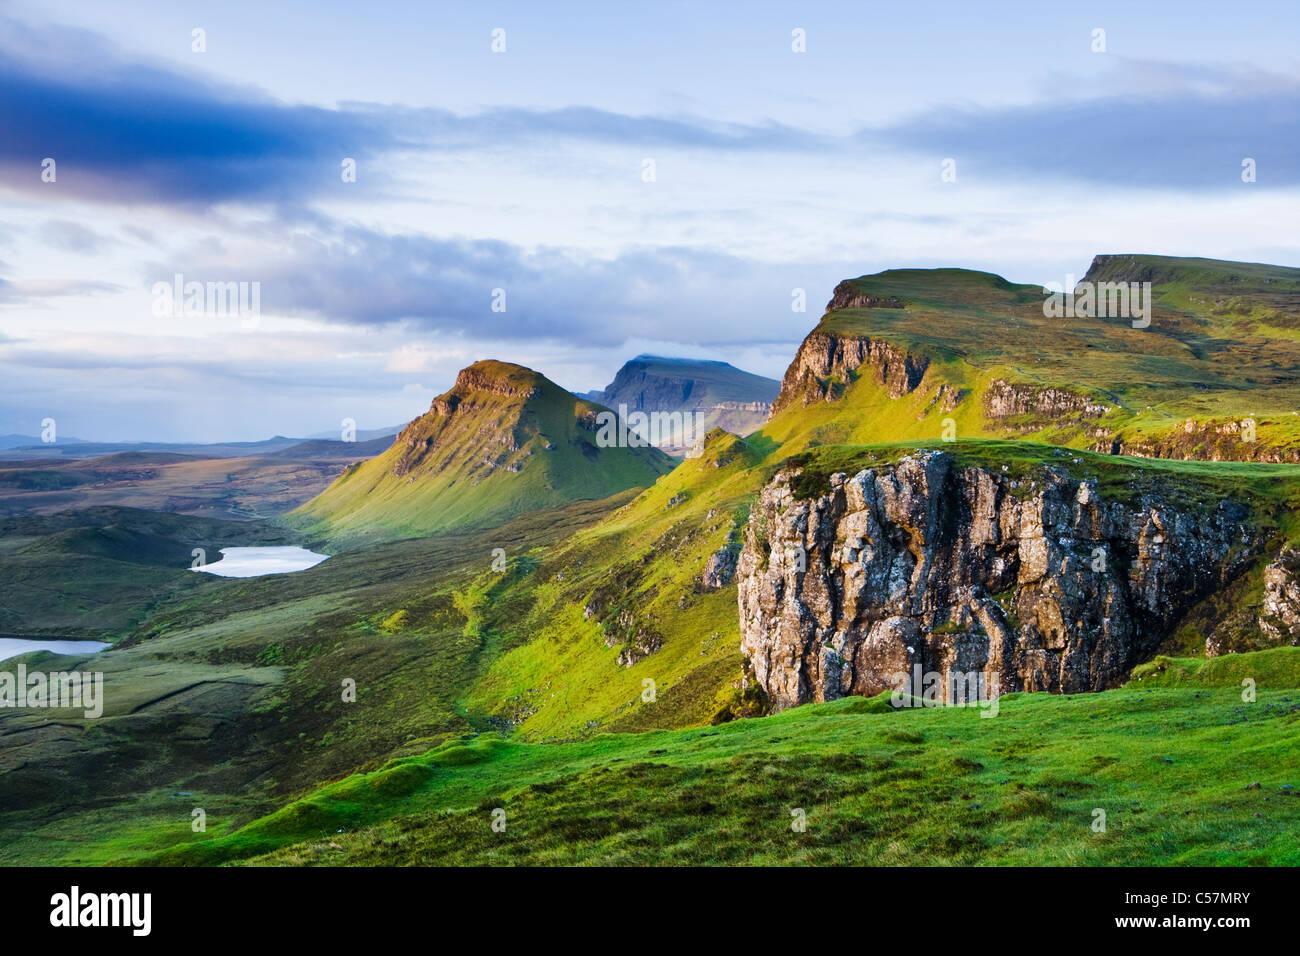 the quiraing isle of skye scotland uk stock photo royalty free image 37664031 alamy. Black Bedroom Furniture Sets. Home Design Ideas